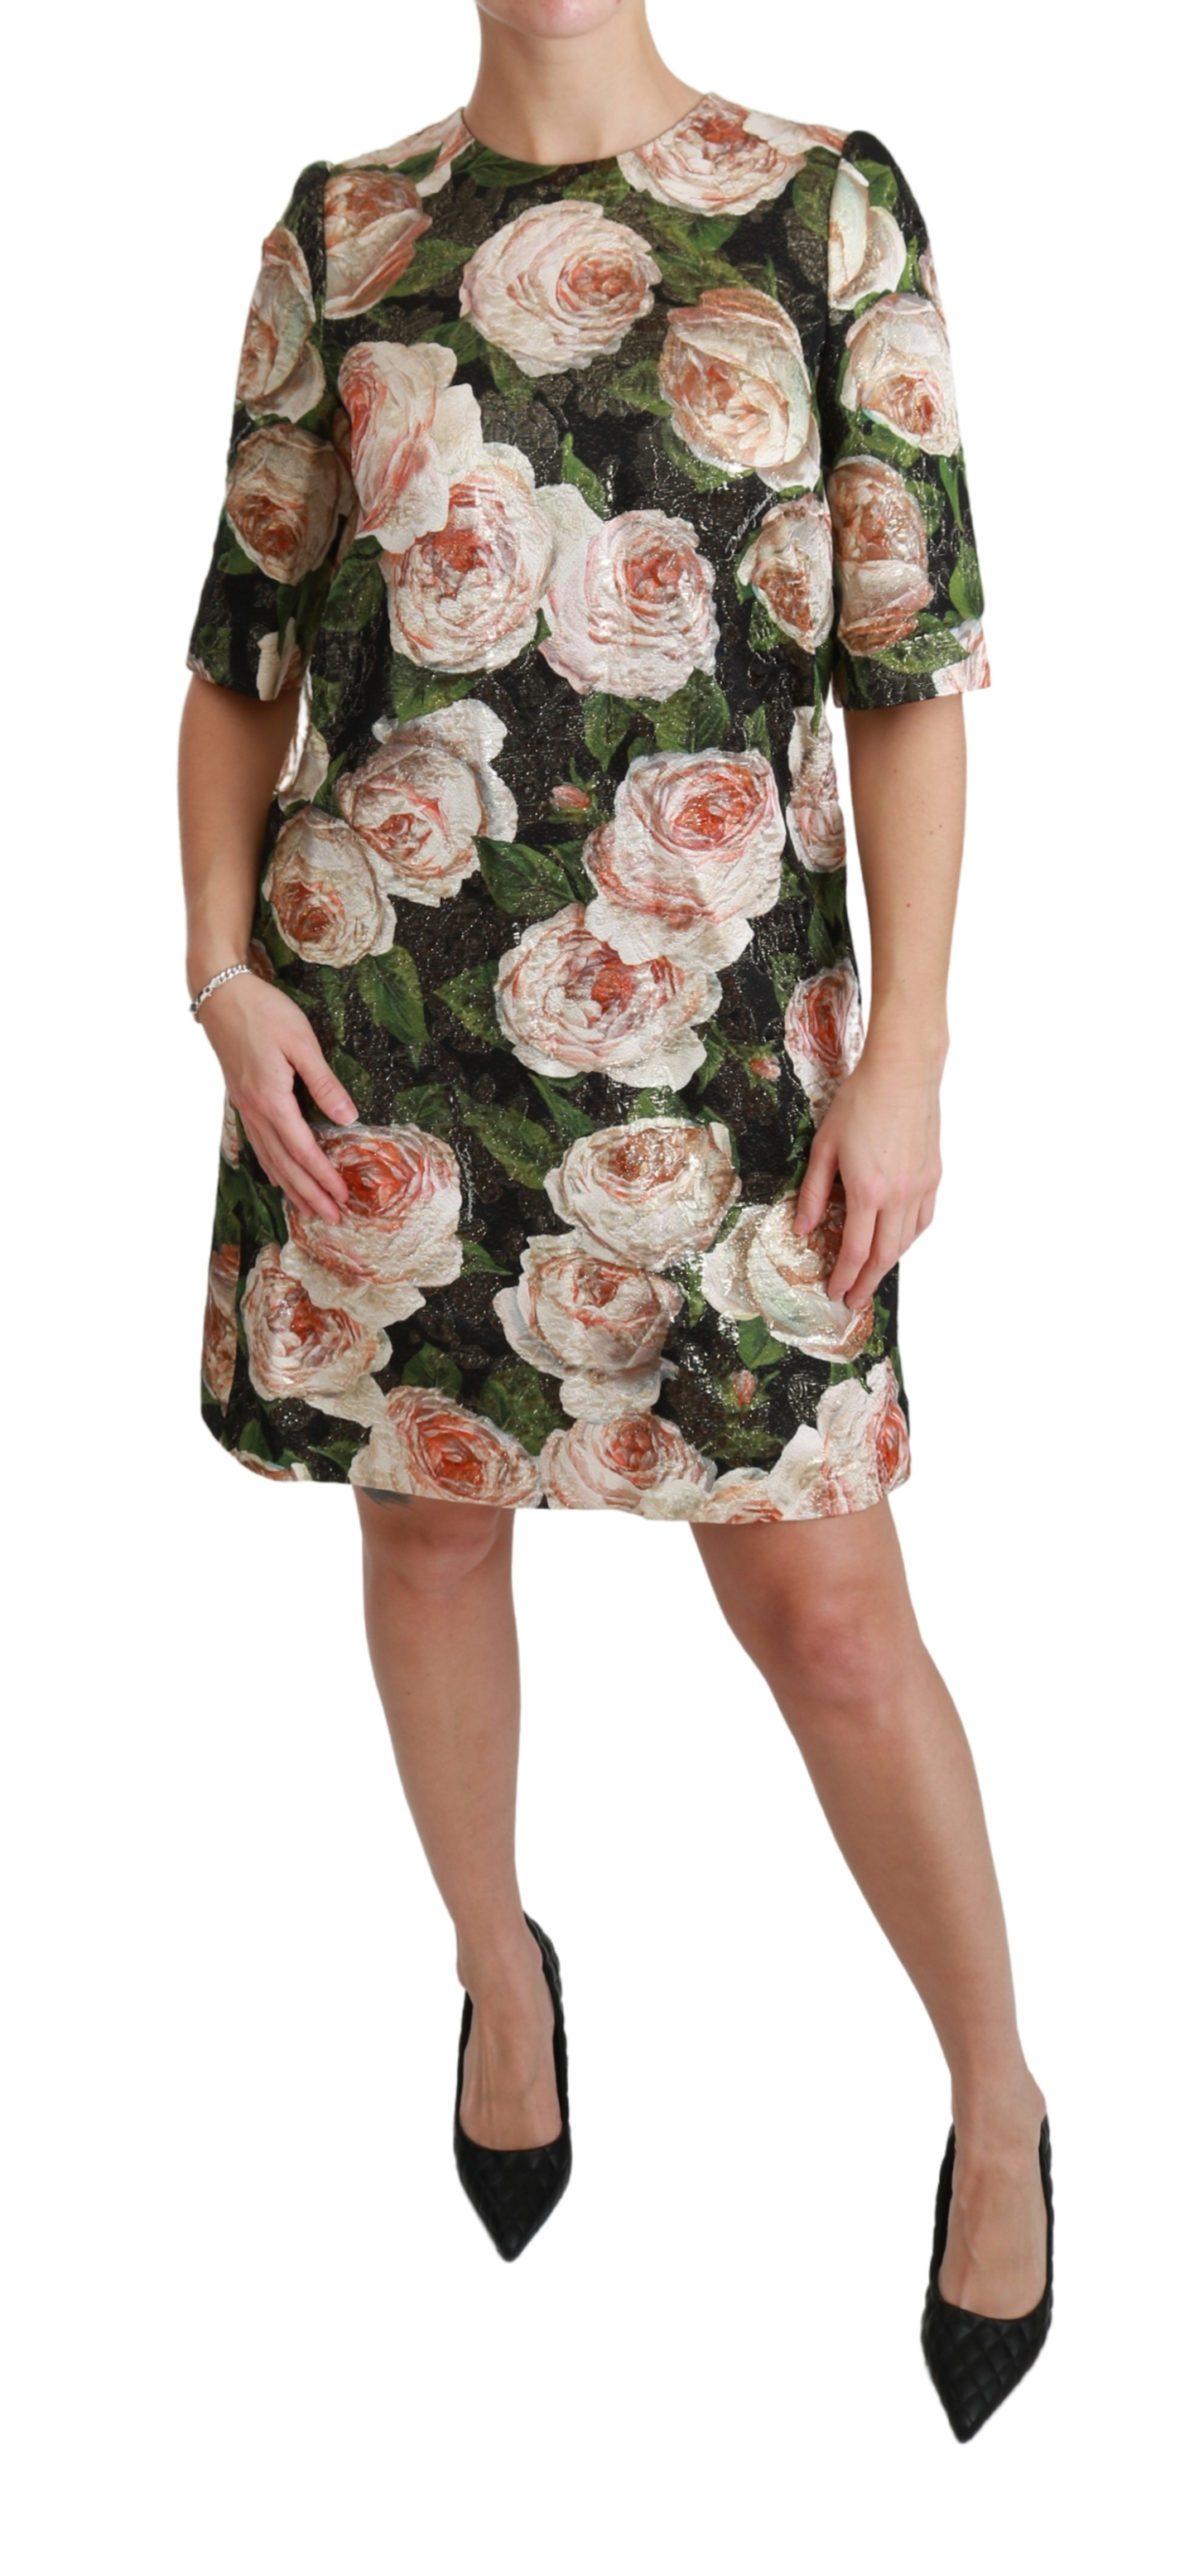 Dolce & Gabbana Women's Roses Flora Shift Mini Dress Black DR2475 - IT42|M